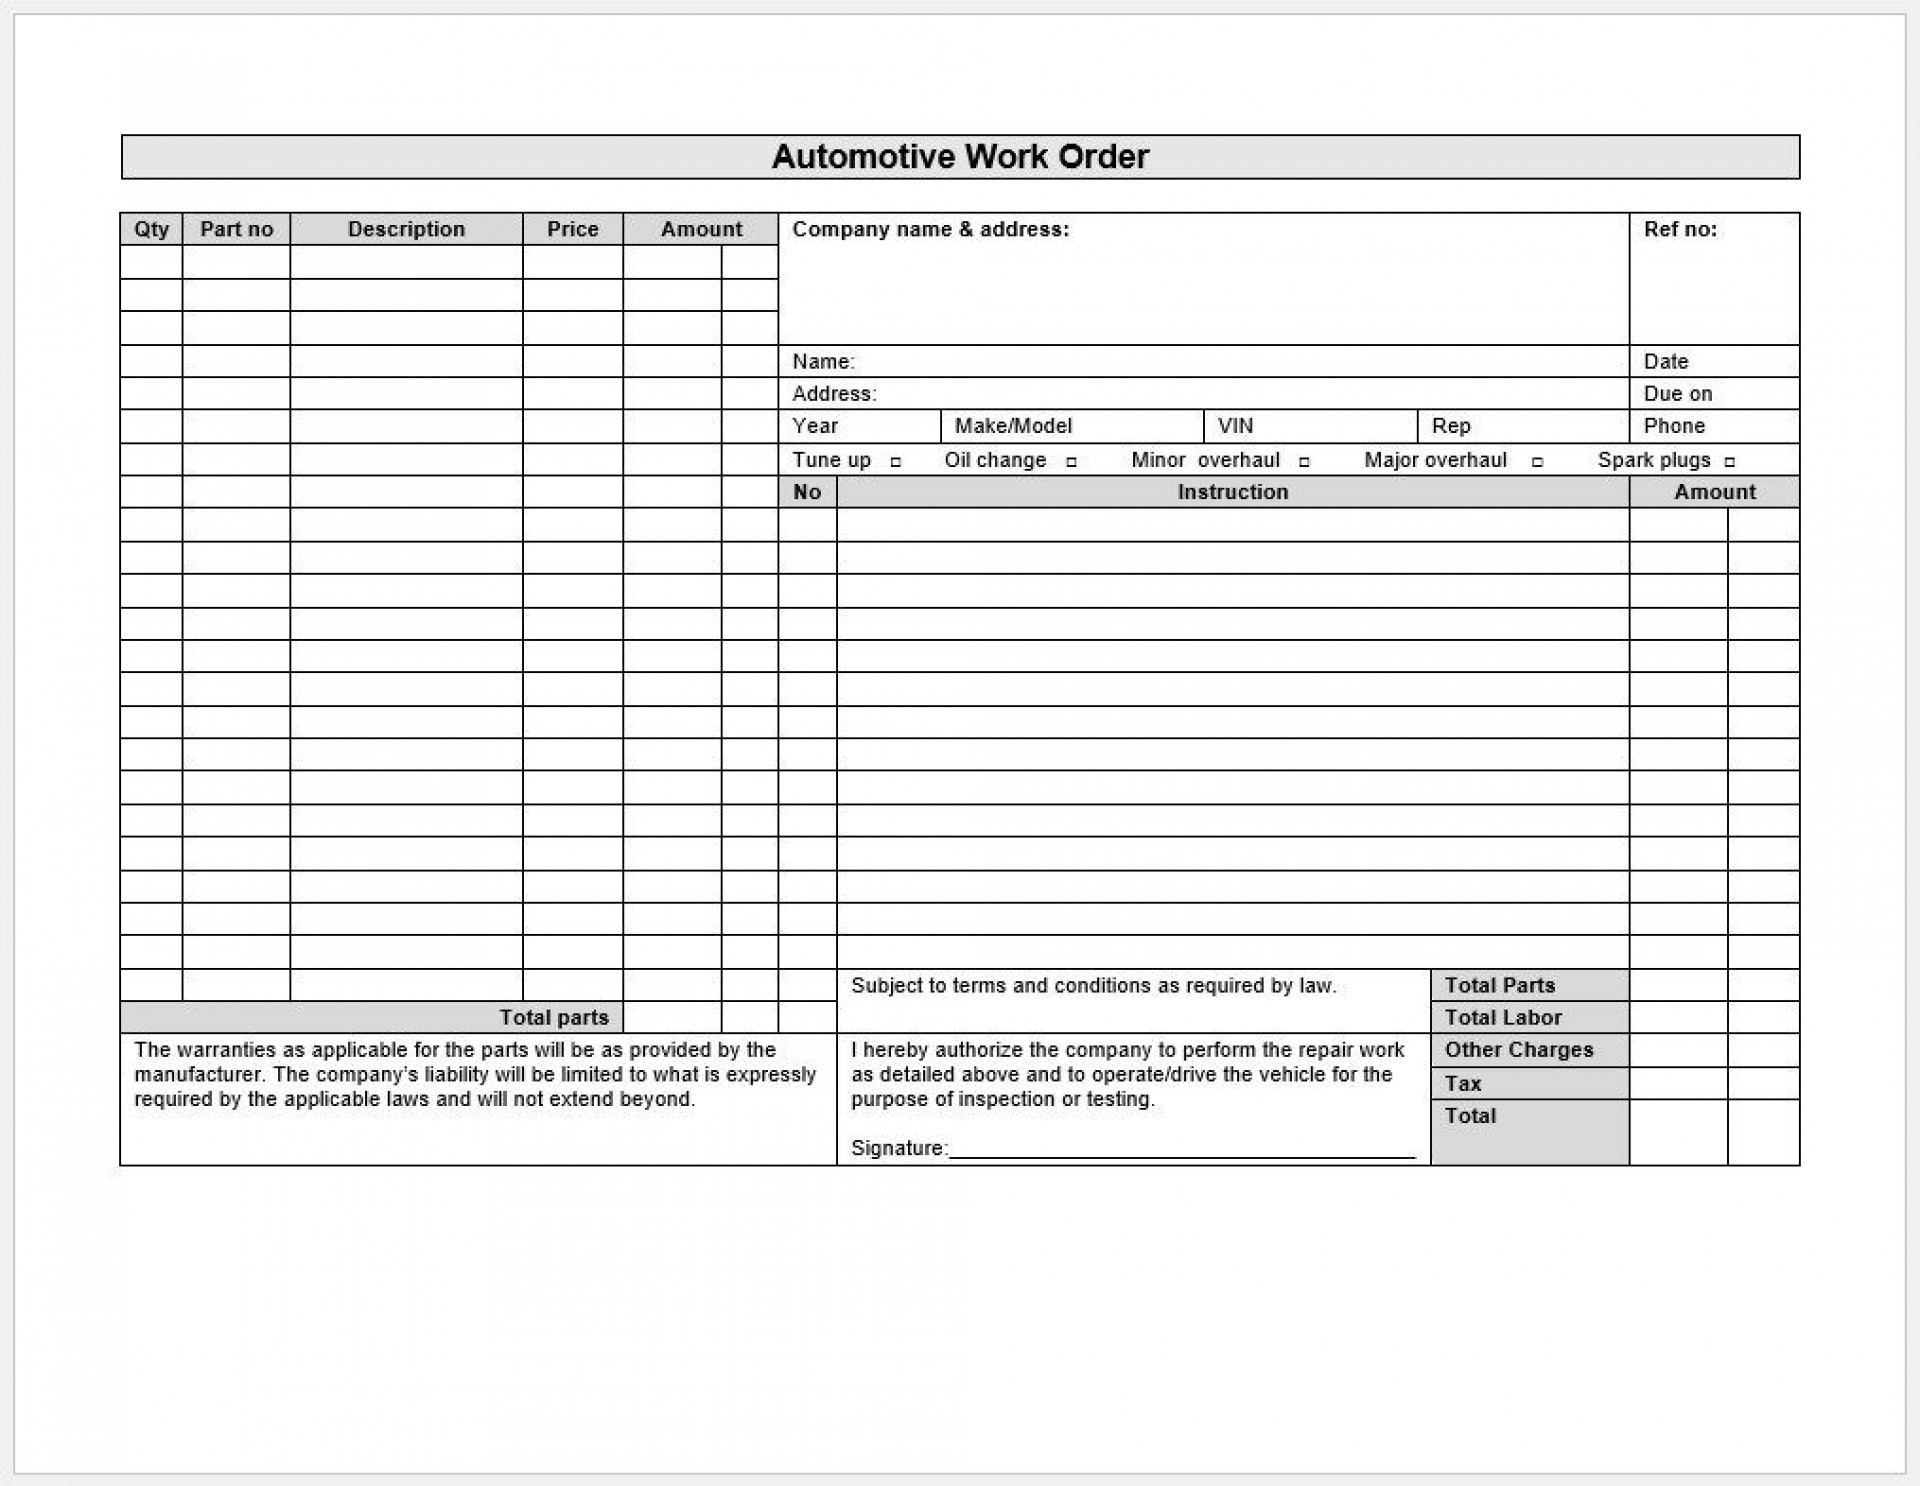 006 Rare Auto Repair Work Order Template Excel Free Image 1920